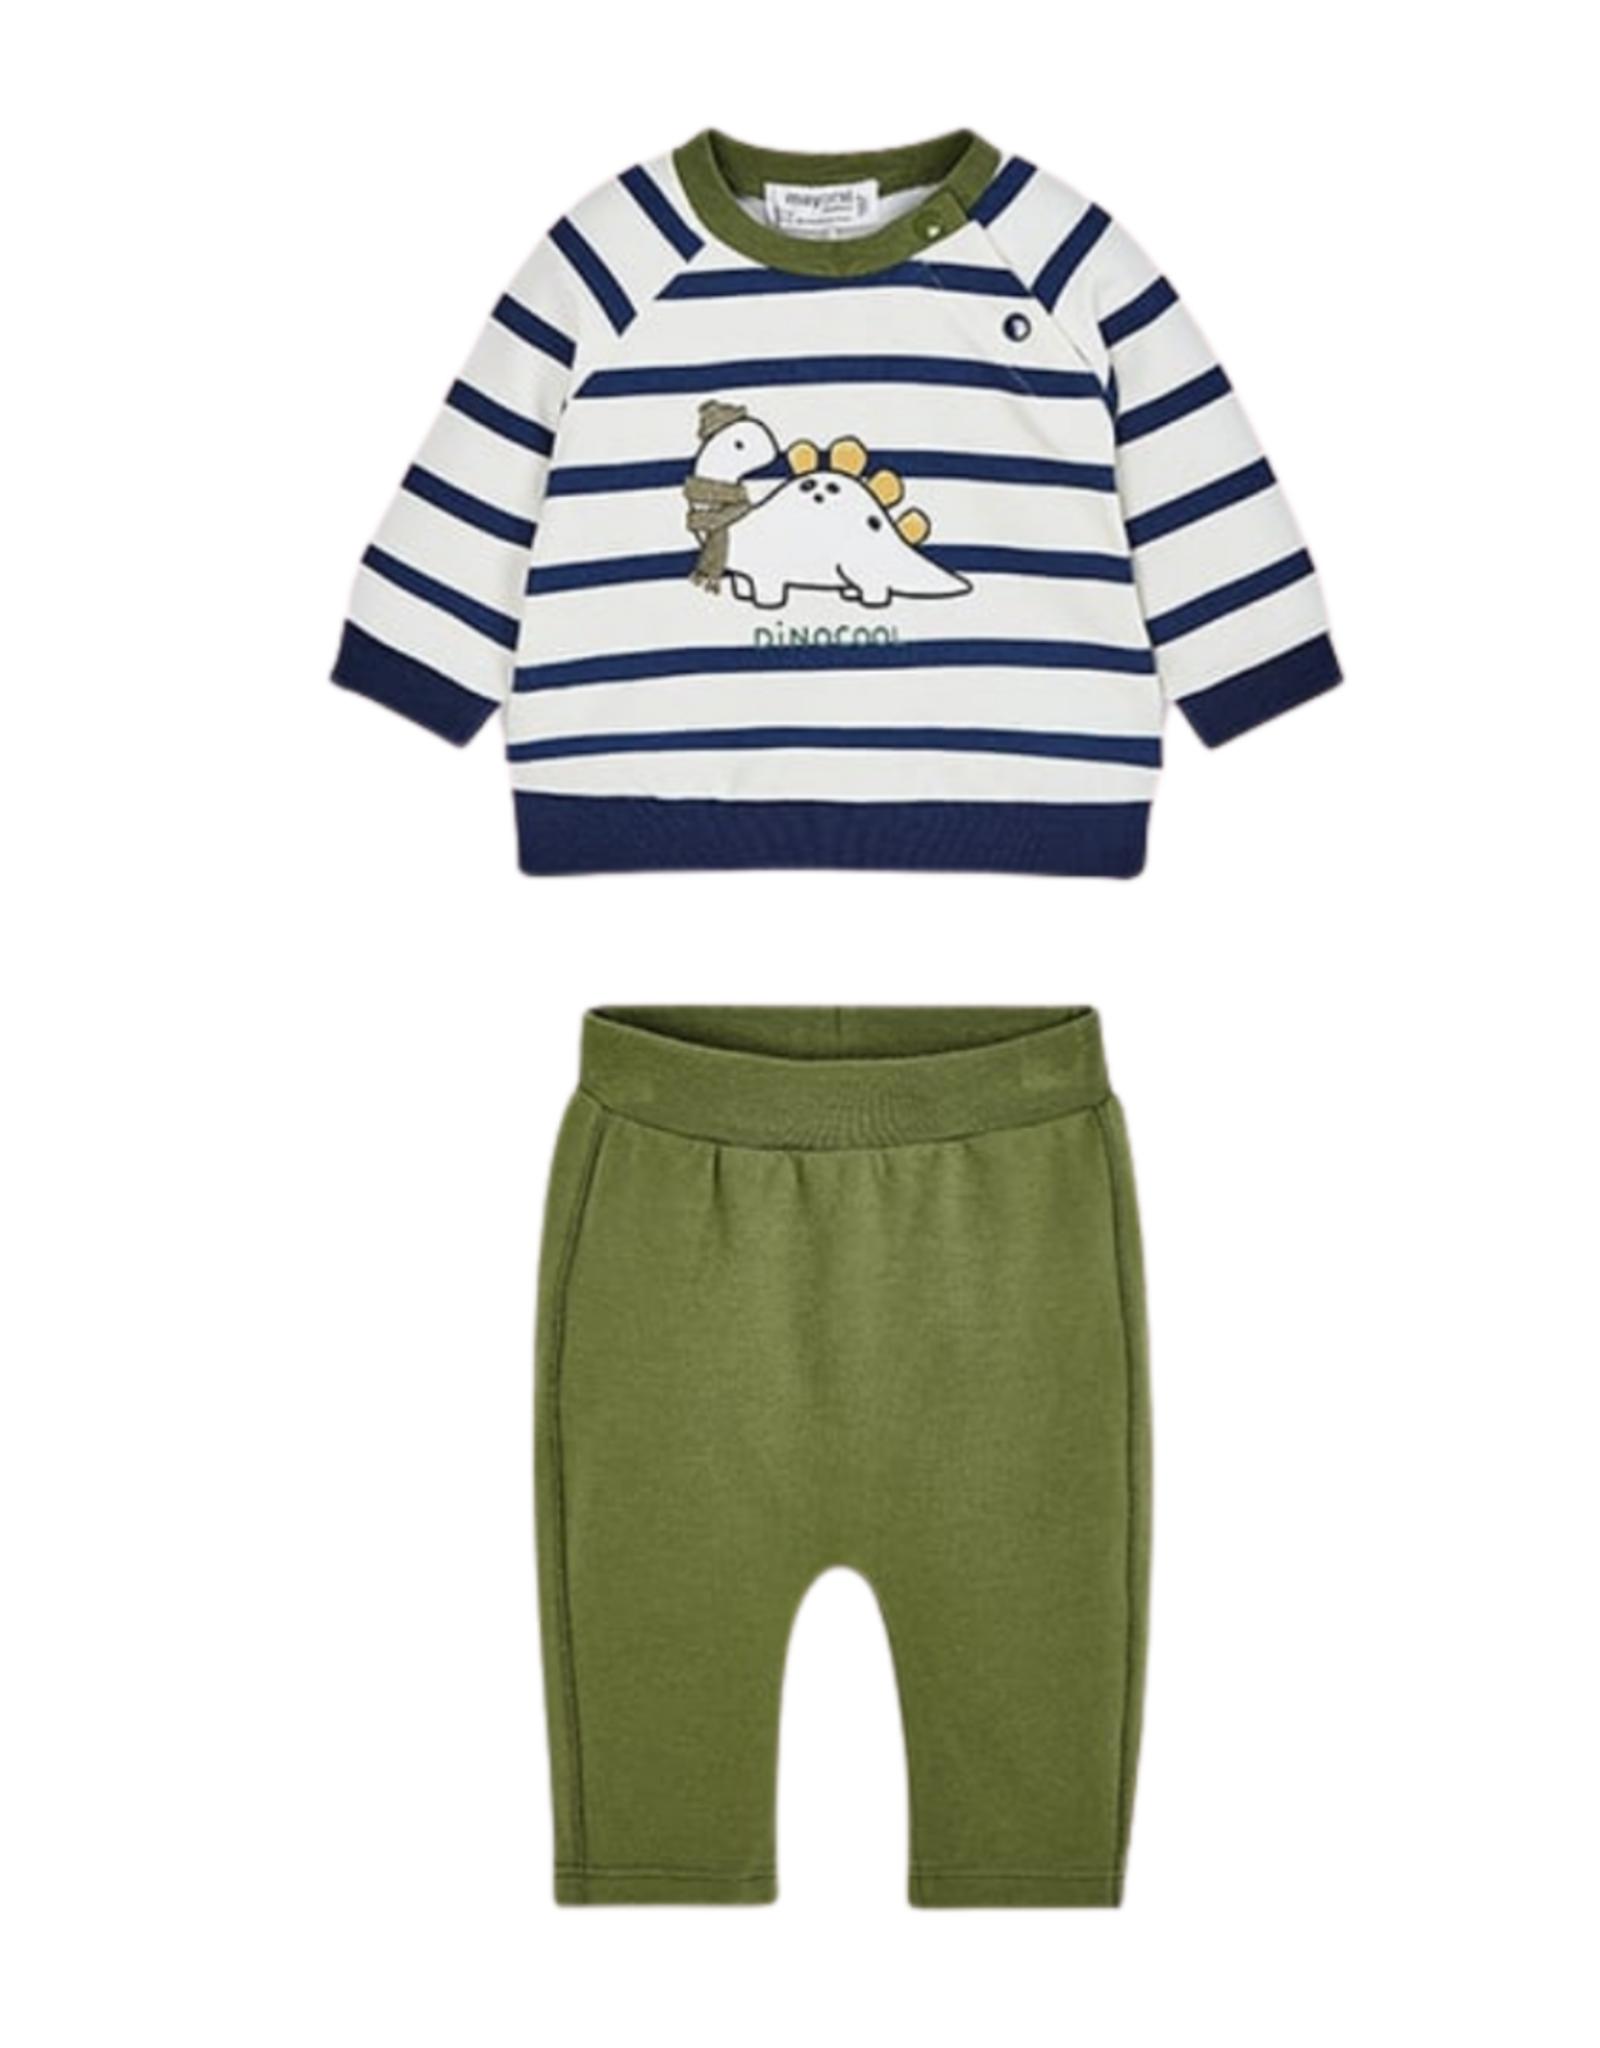 Mayoral Sweatshirt & Pants - Dinosaur- Green/Navy